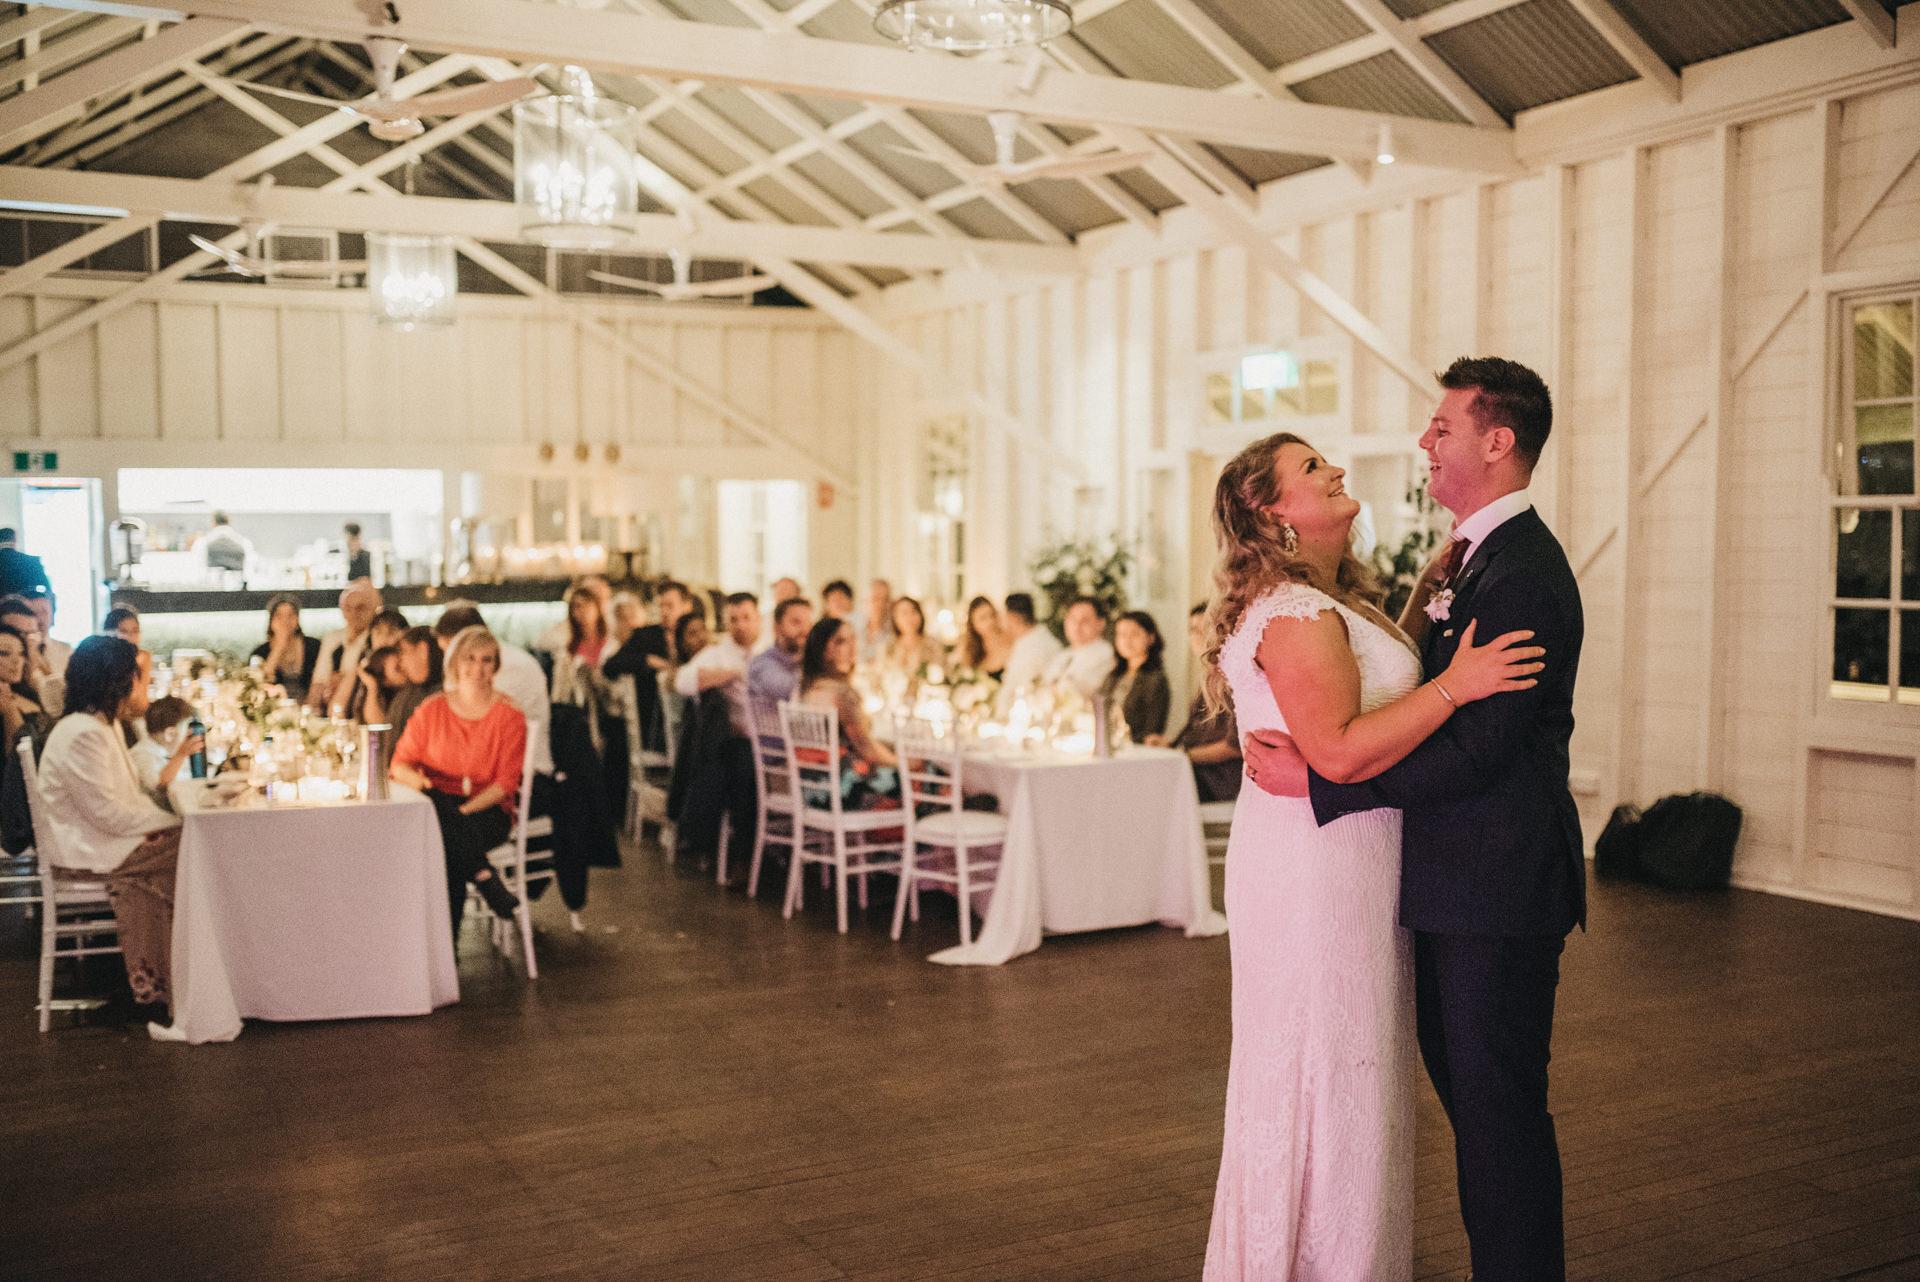 athol hall venue function center wedding